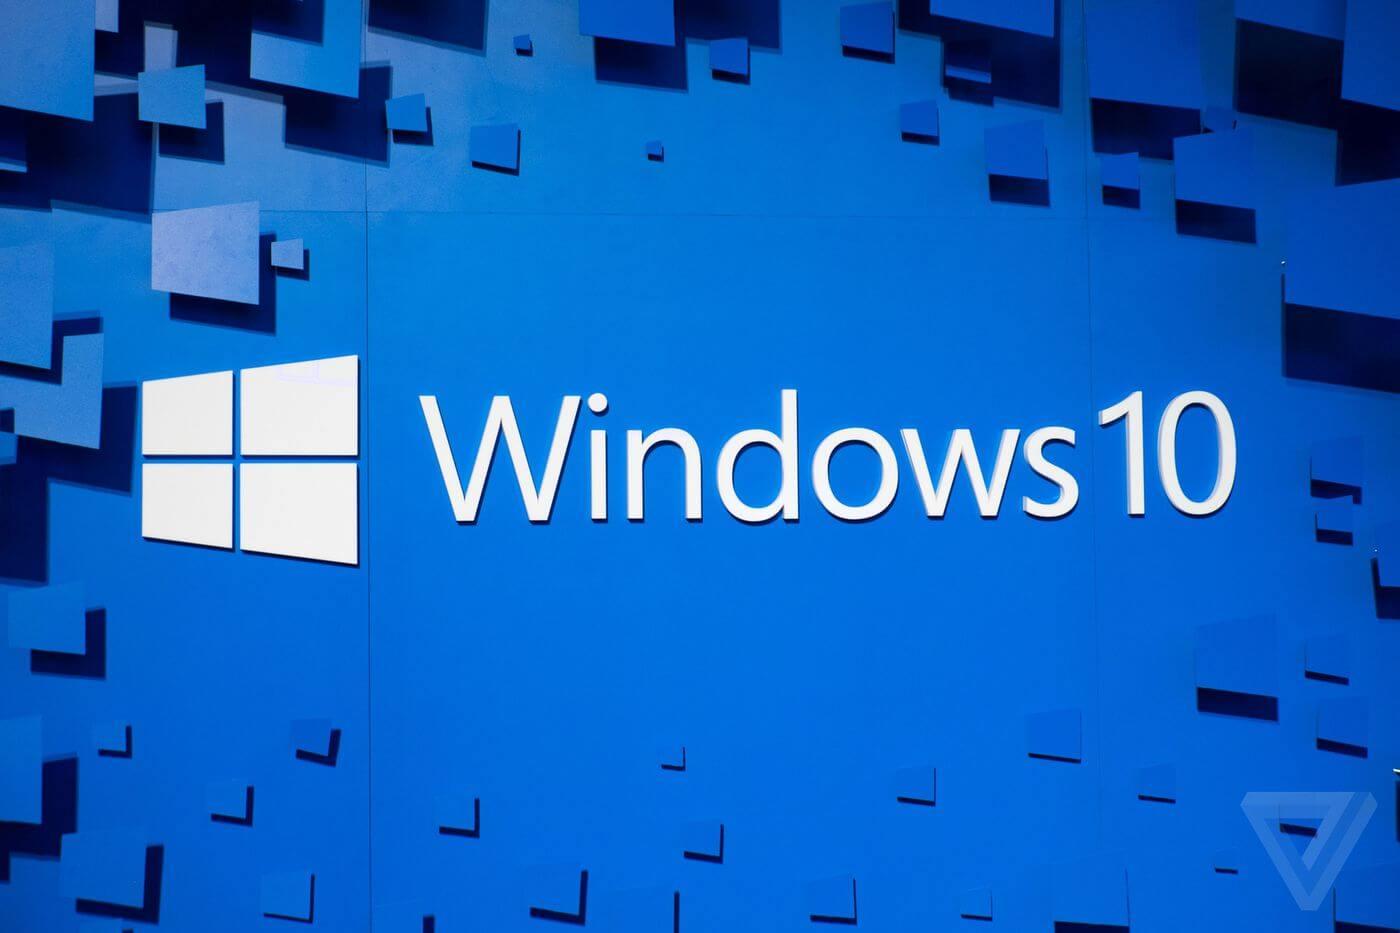 Windows 10 image